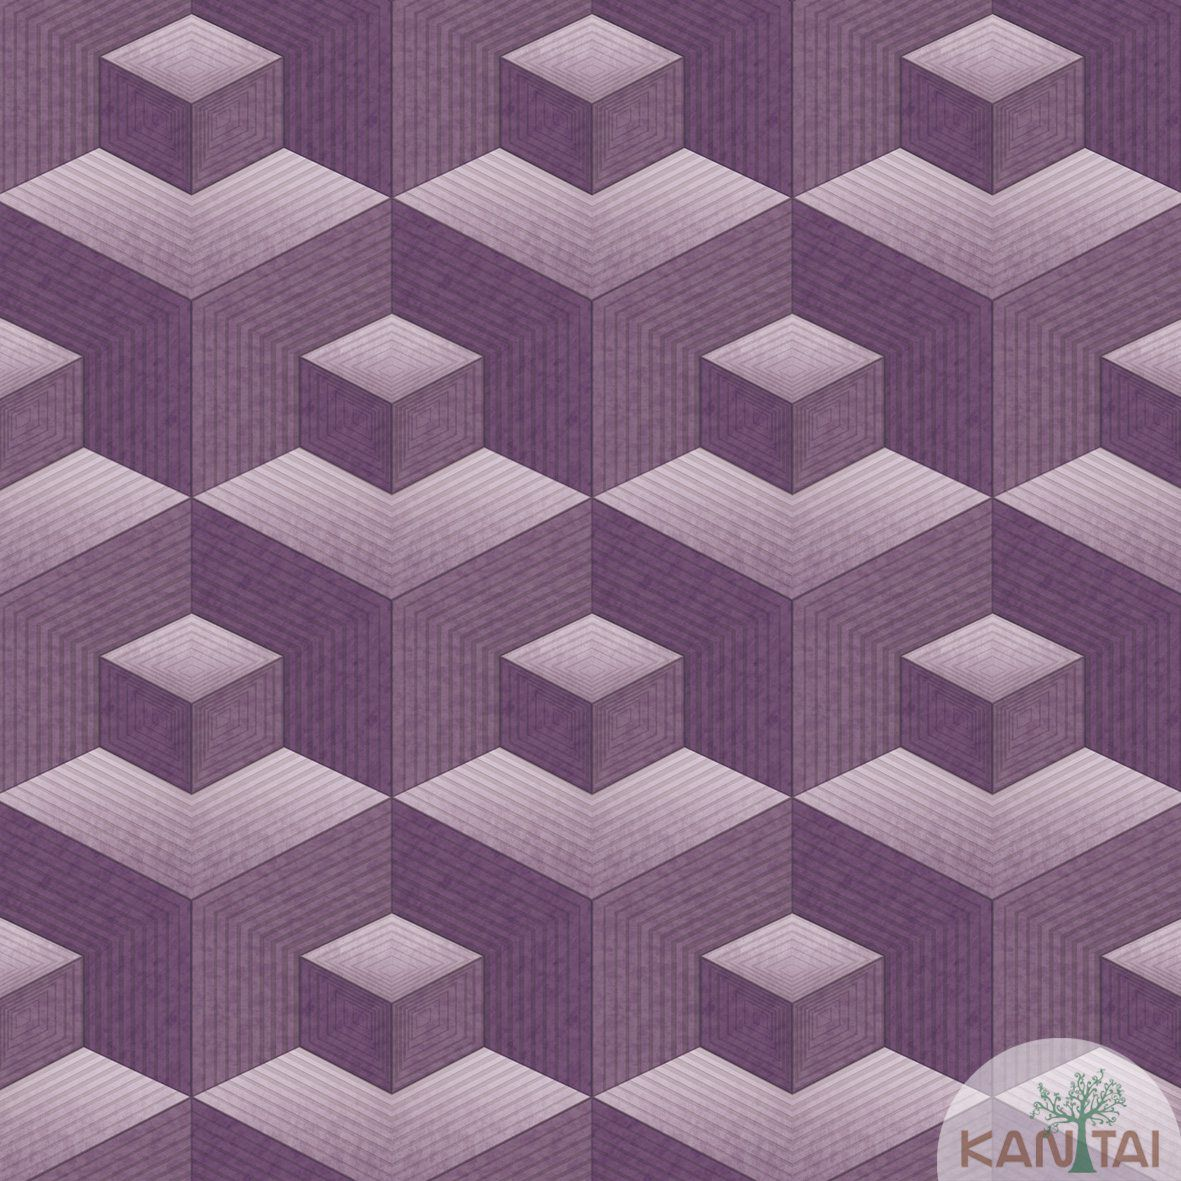 Papel de Parede   Kan Tai  Vinilico Coleção Neonature III 3D Geométrico Roxo, Cinza